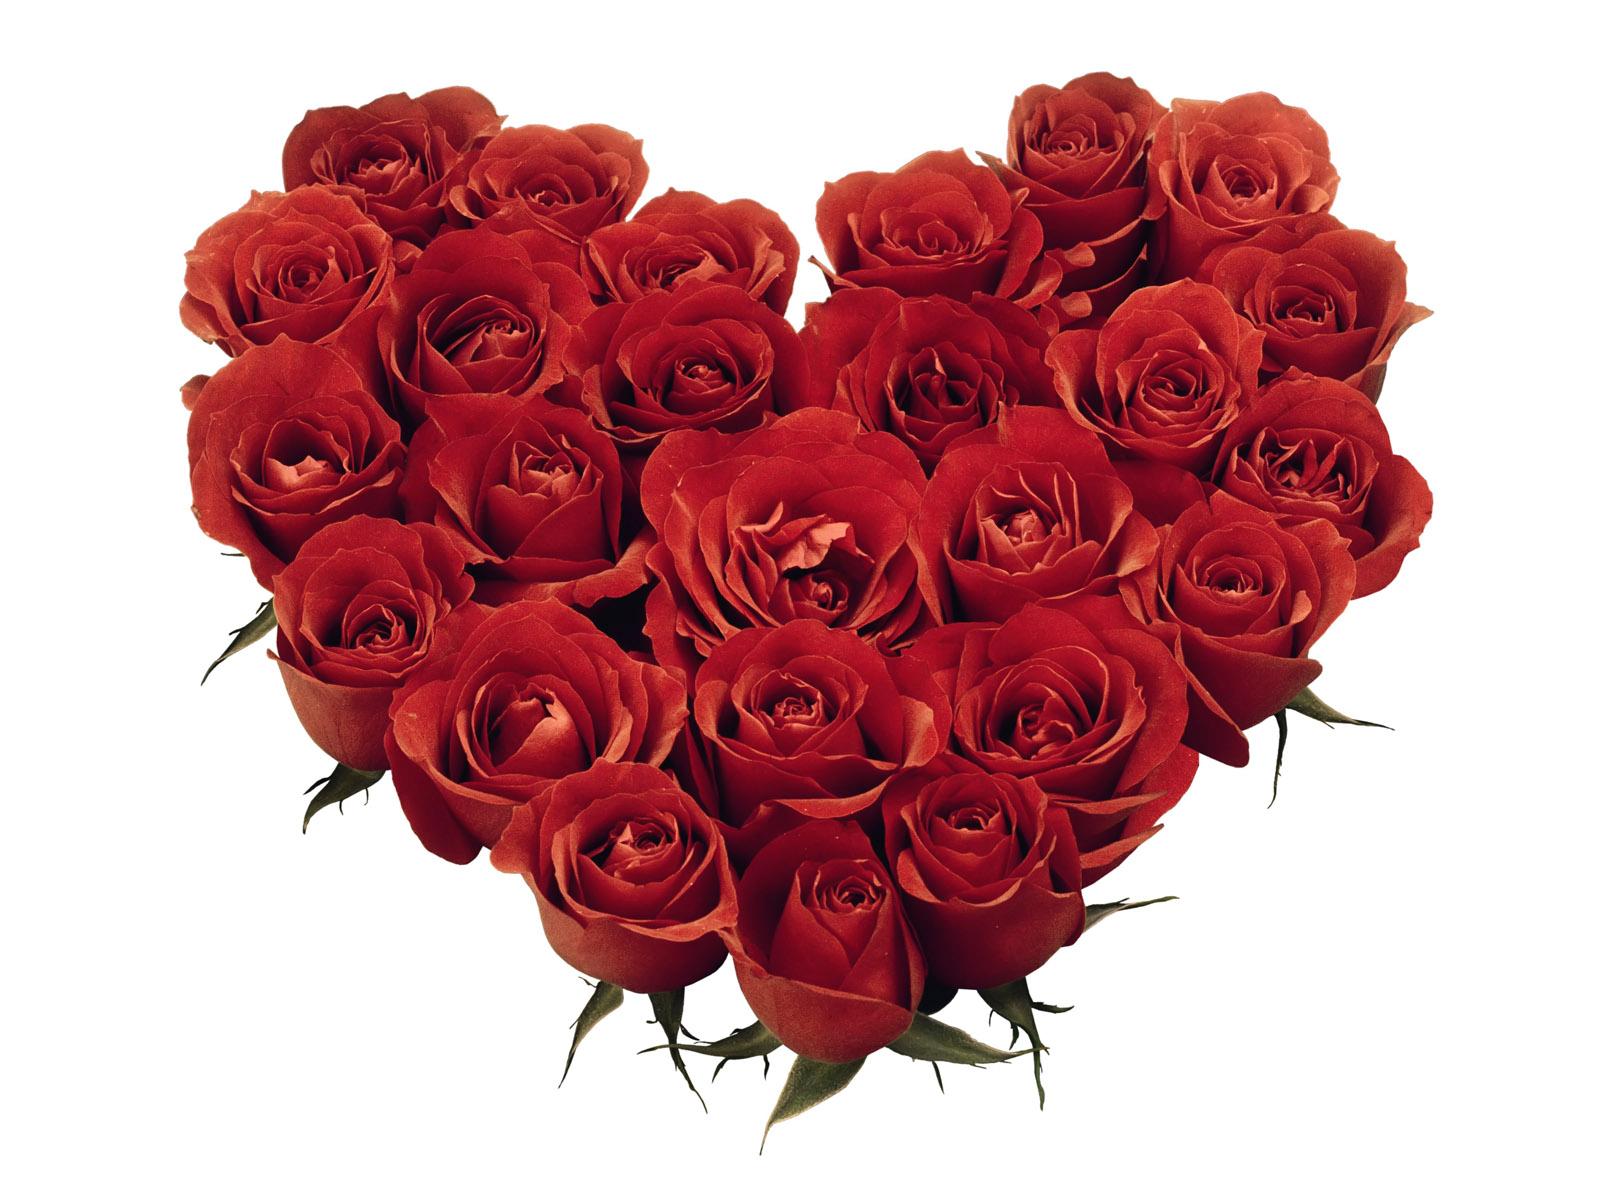 красива за свети валентин